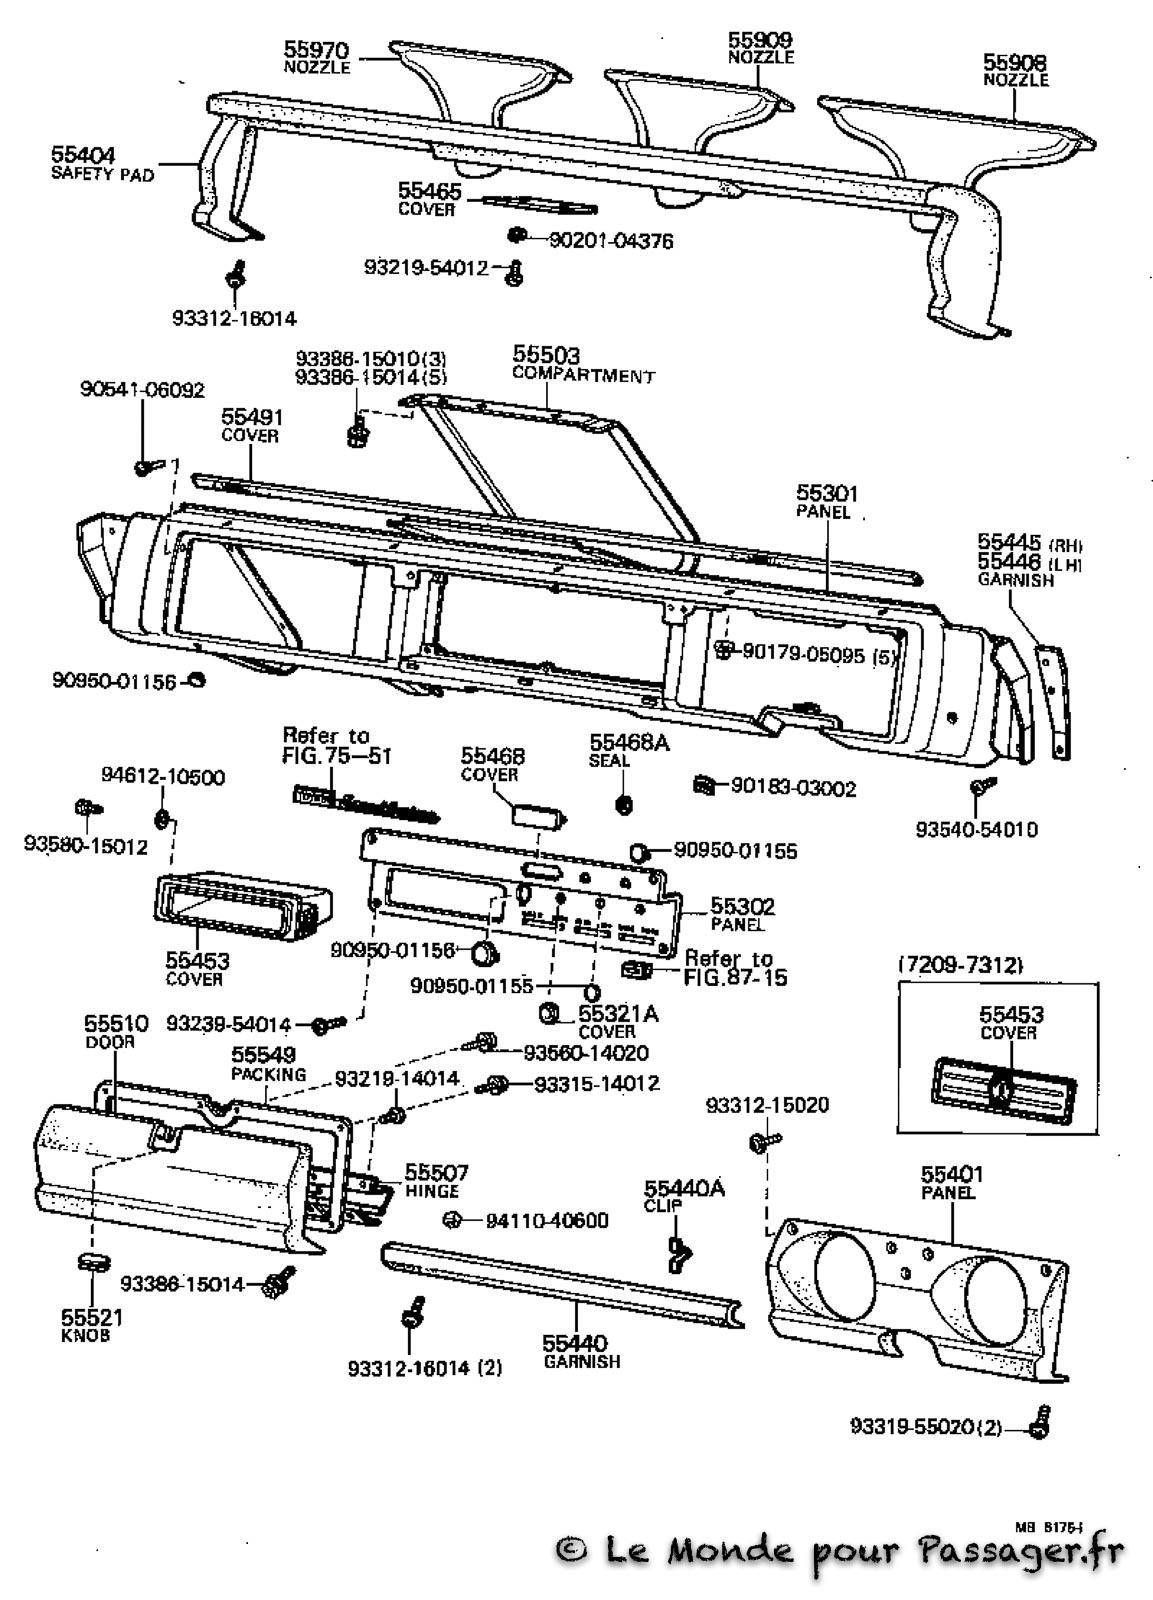 Fj55-Eclatés-Techniques083